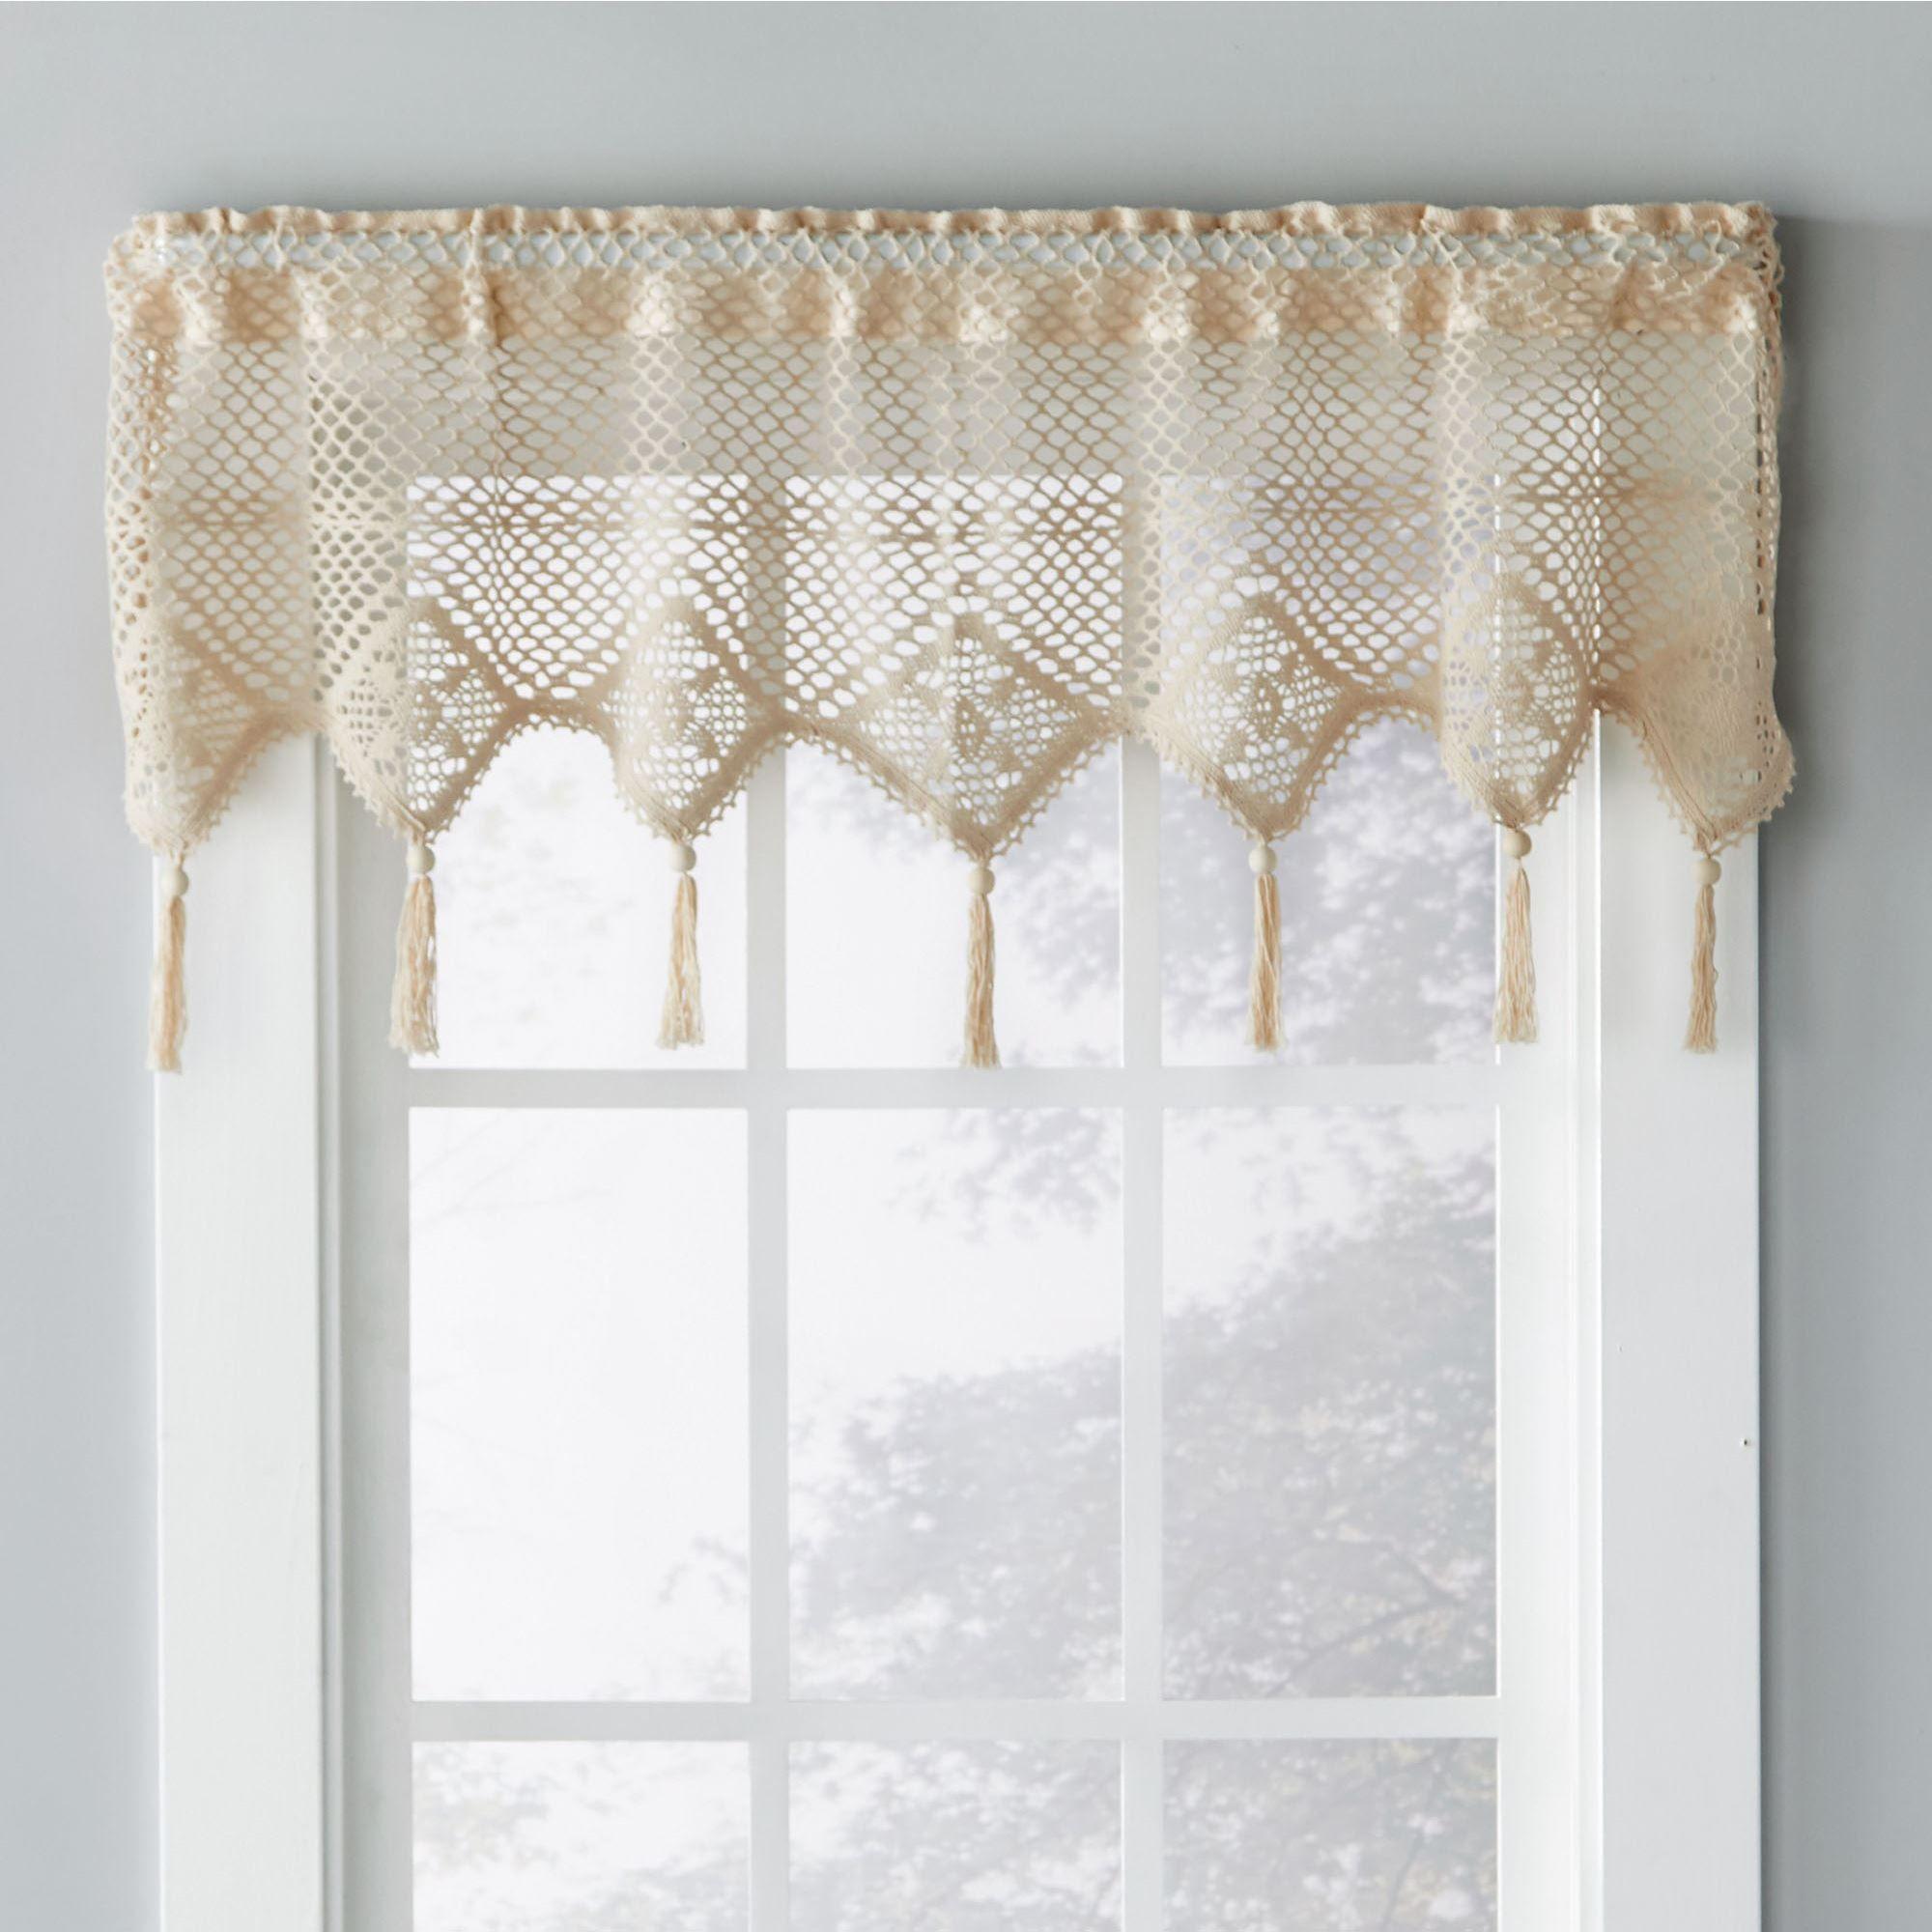 Boho Tasseled Crochet Window Valance